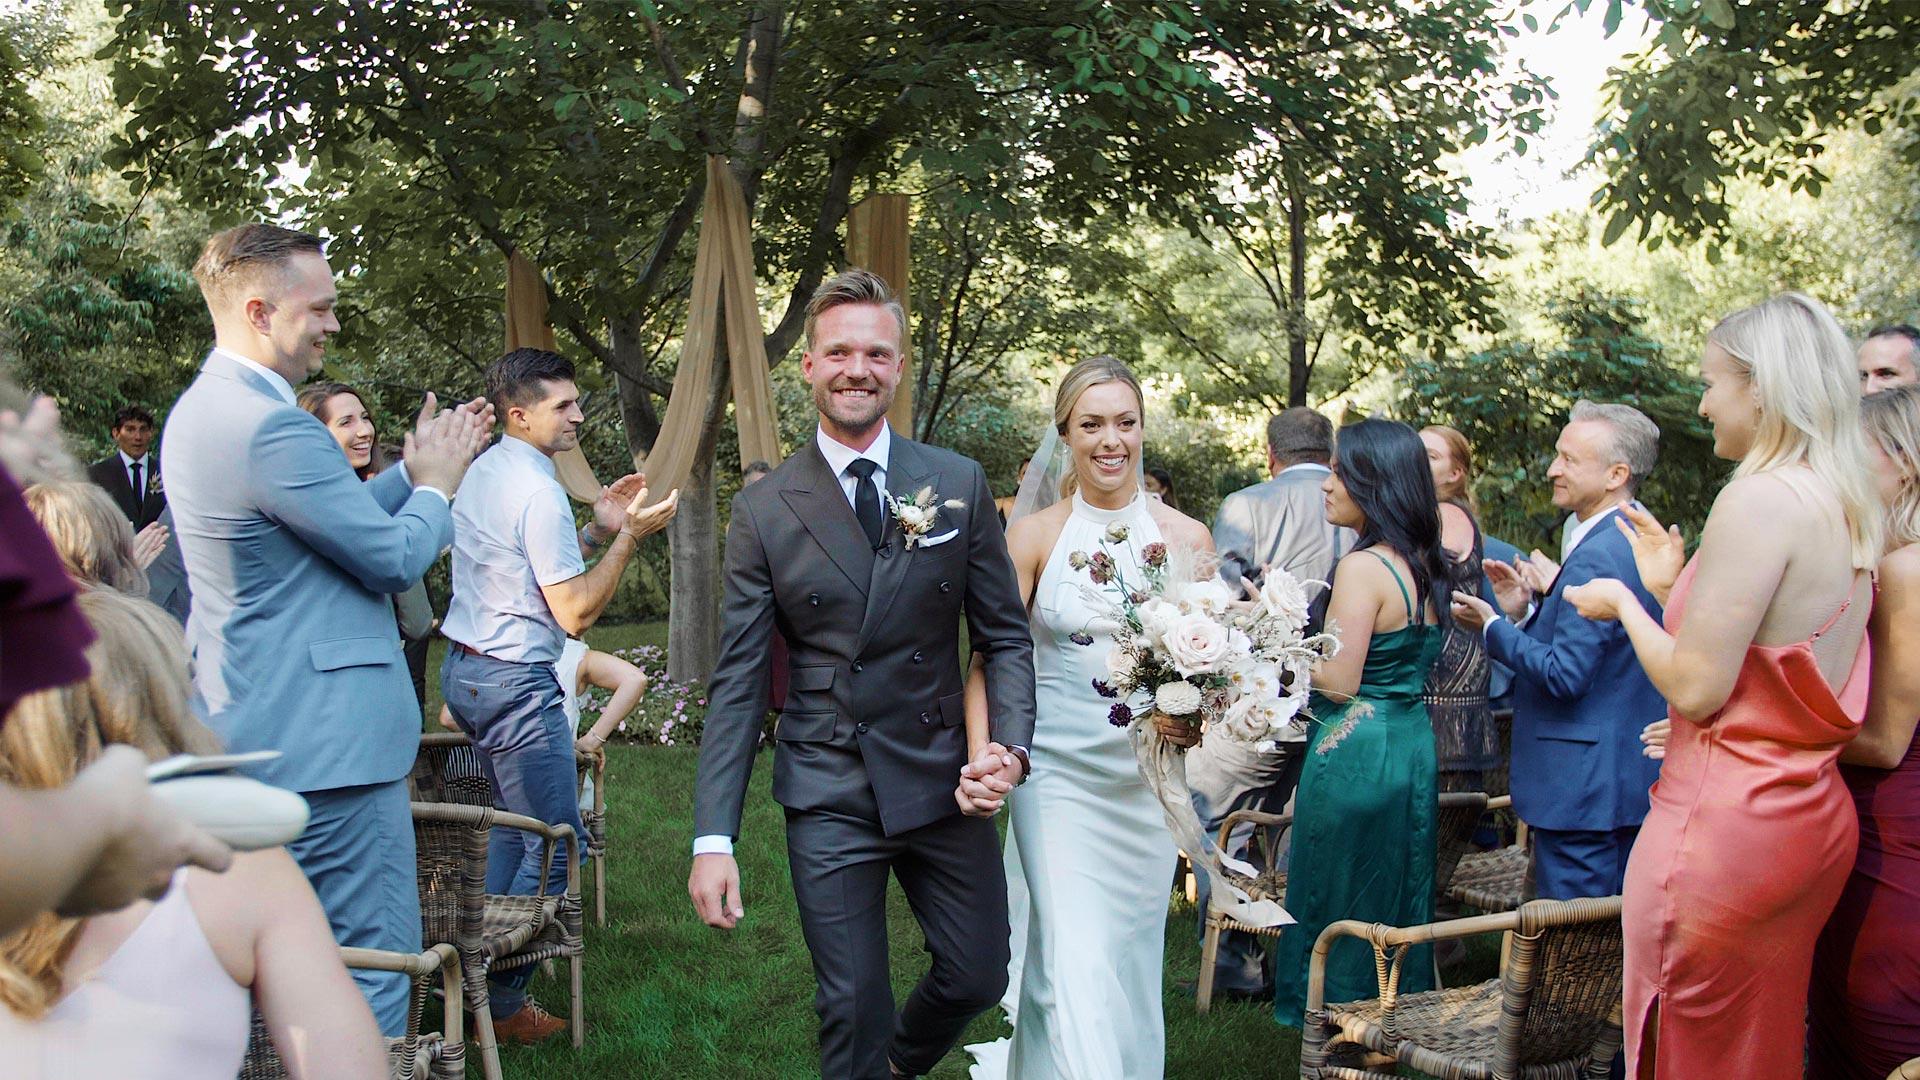 procession at an Linden Gardens Wedding by Okanagan Wedding Videographer Kismet Creative